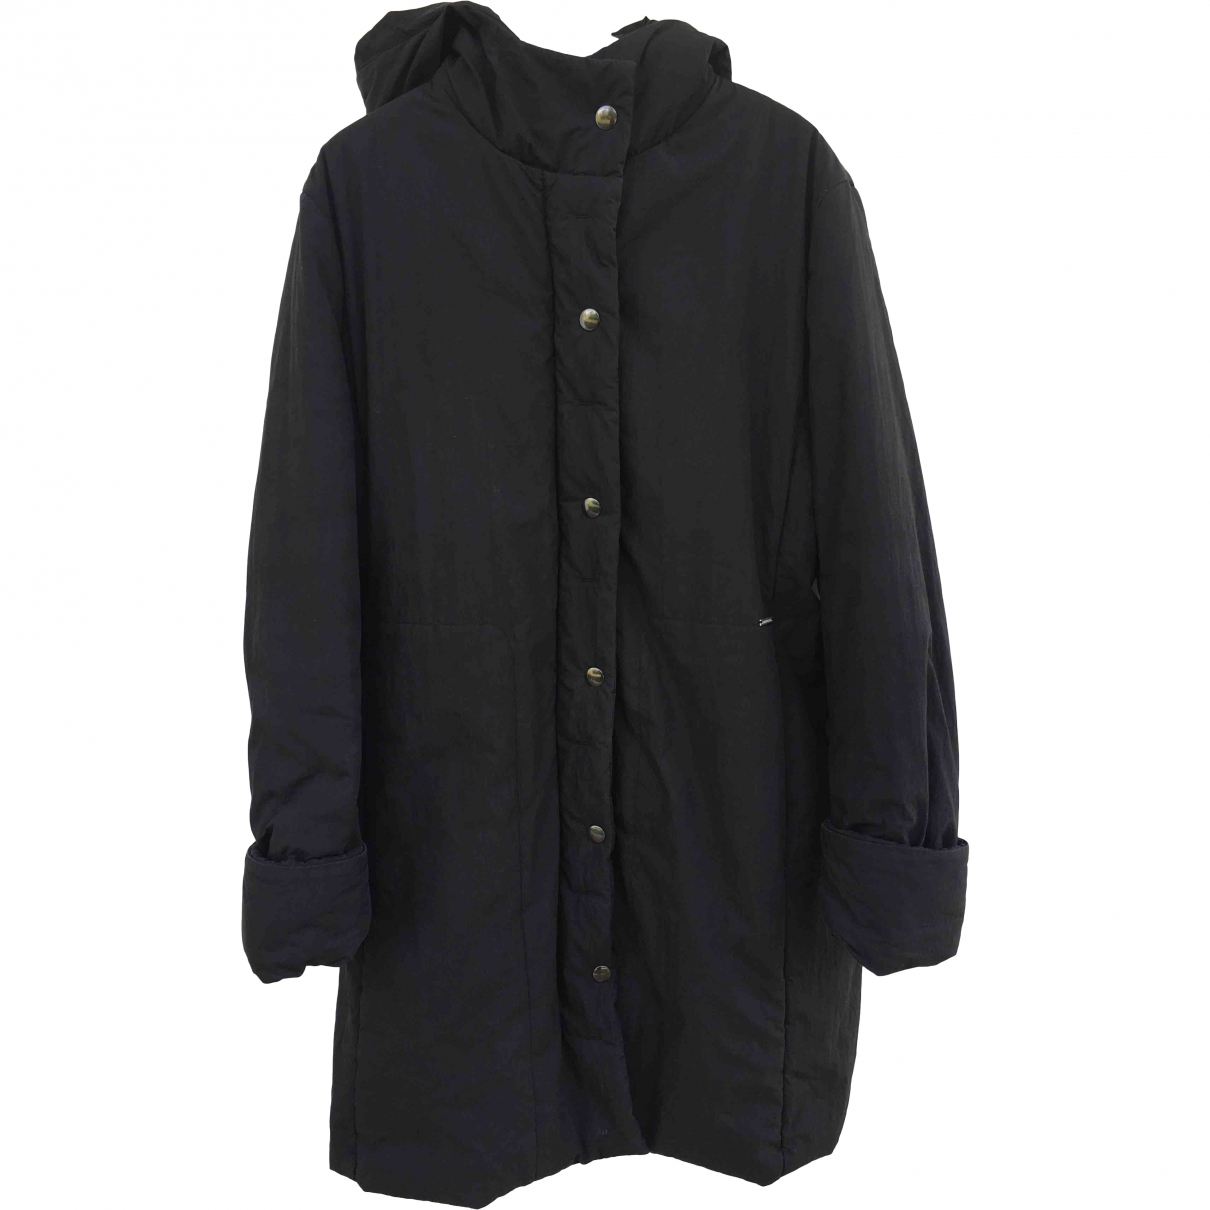 Valentino Garavani \N Black Cotton coat for Women 44 IT